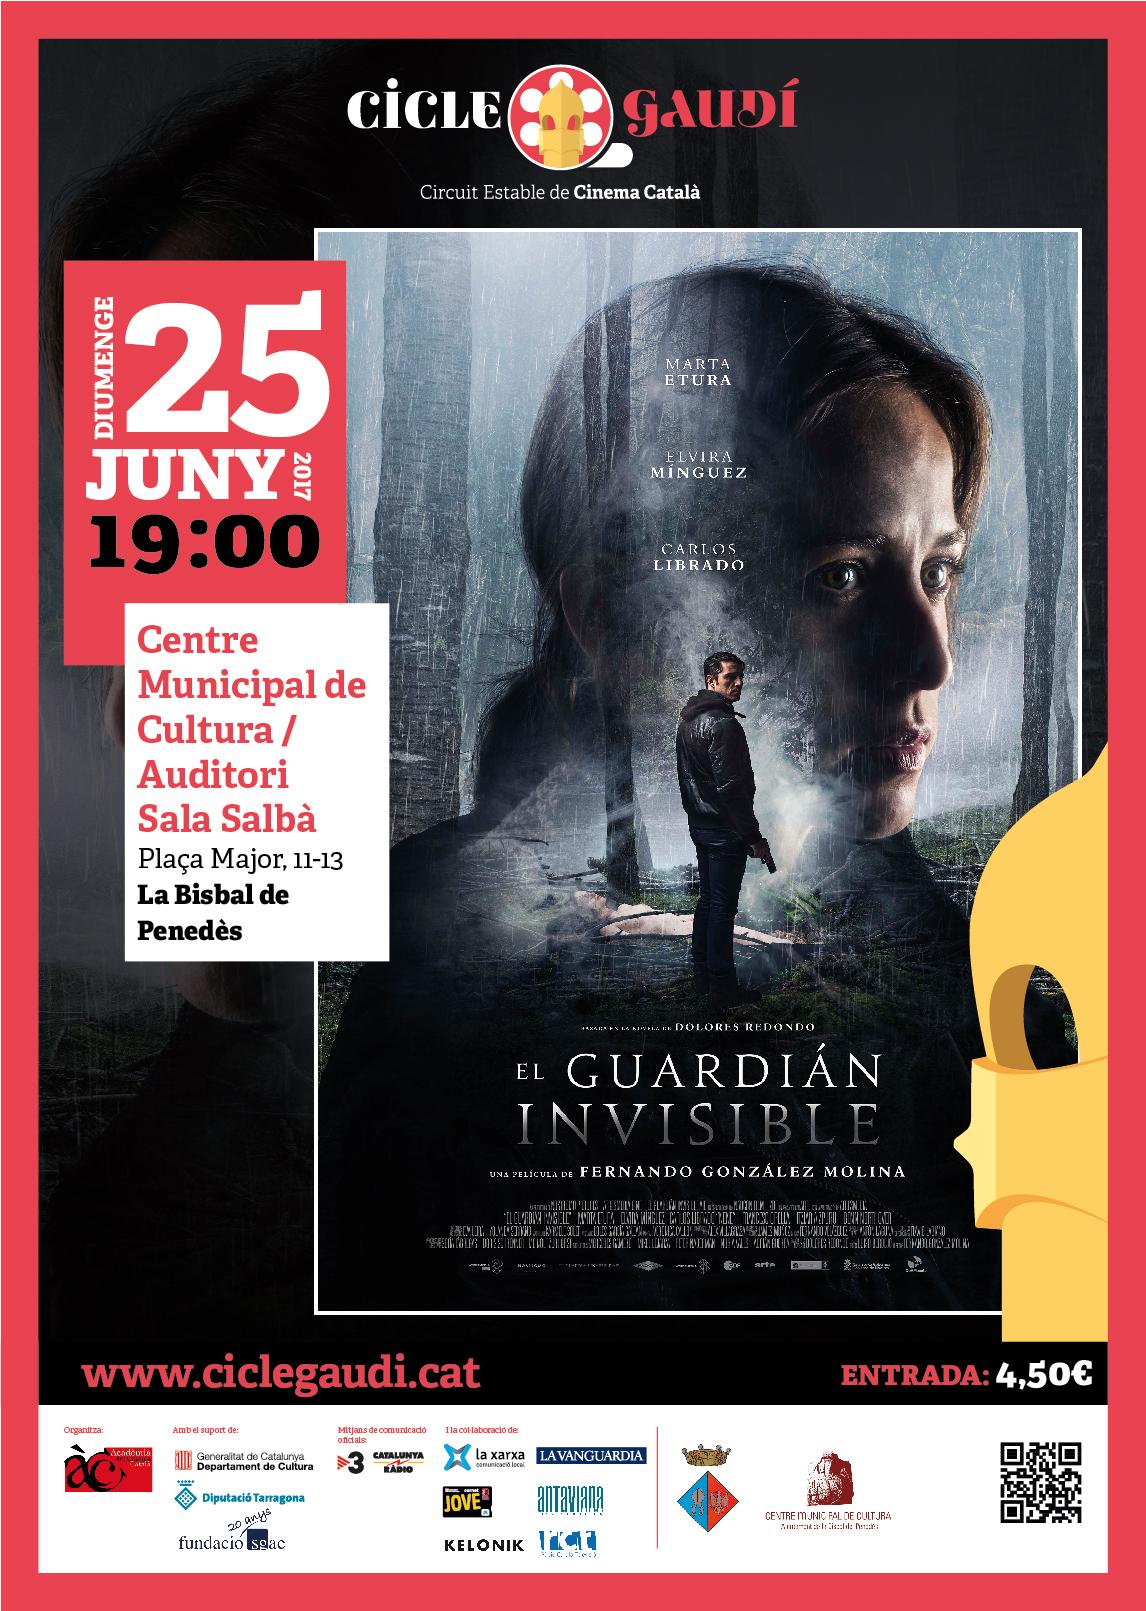 El 25 de juny es projectarà 'El guardián invisible' al CMC en el marc del Cicle Gaudí